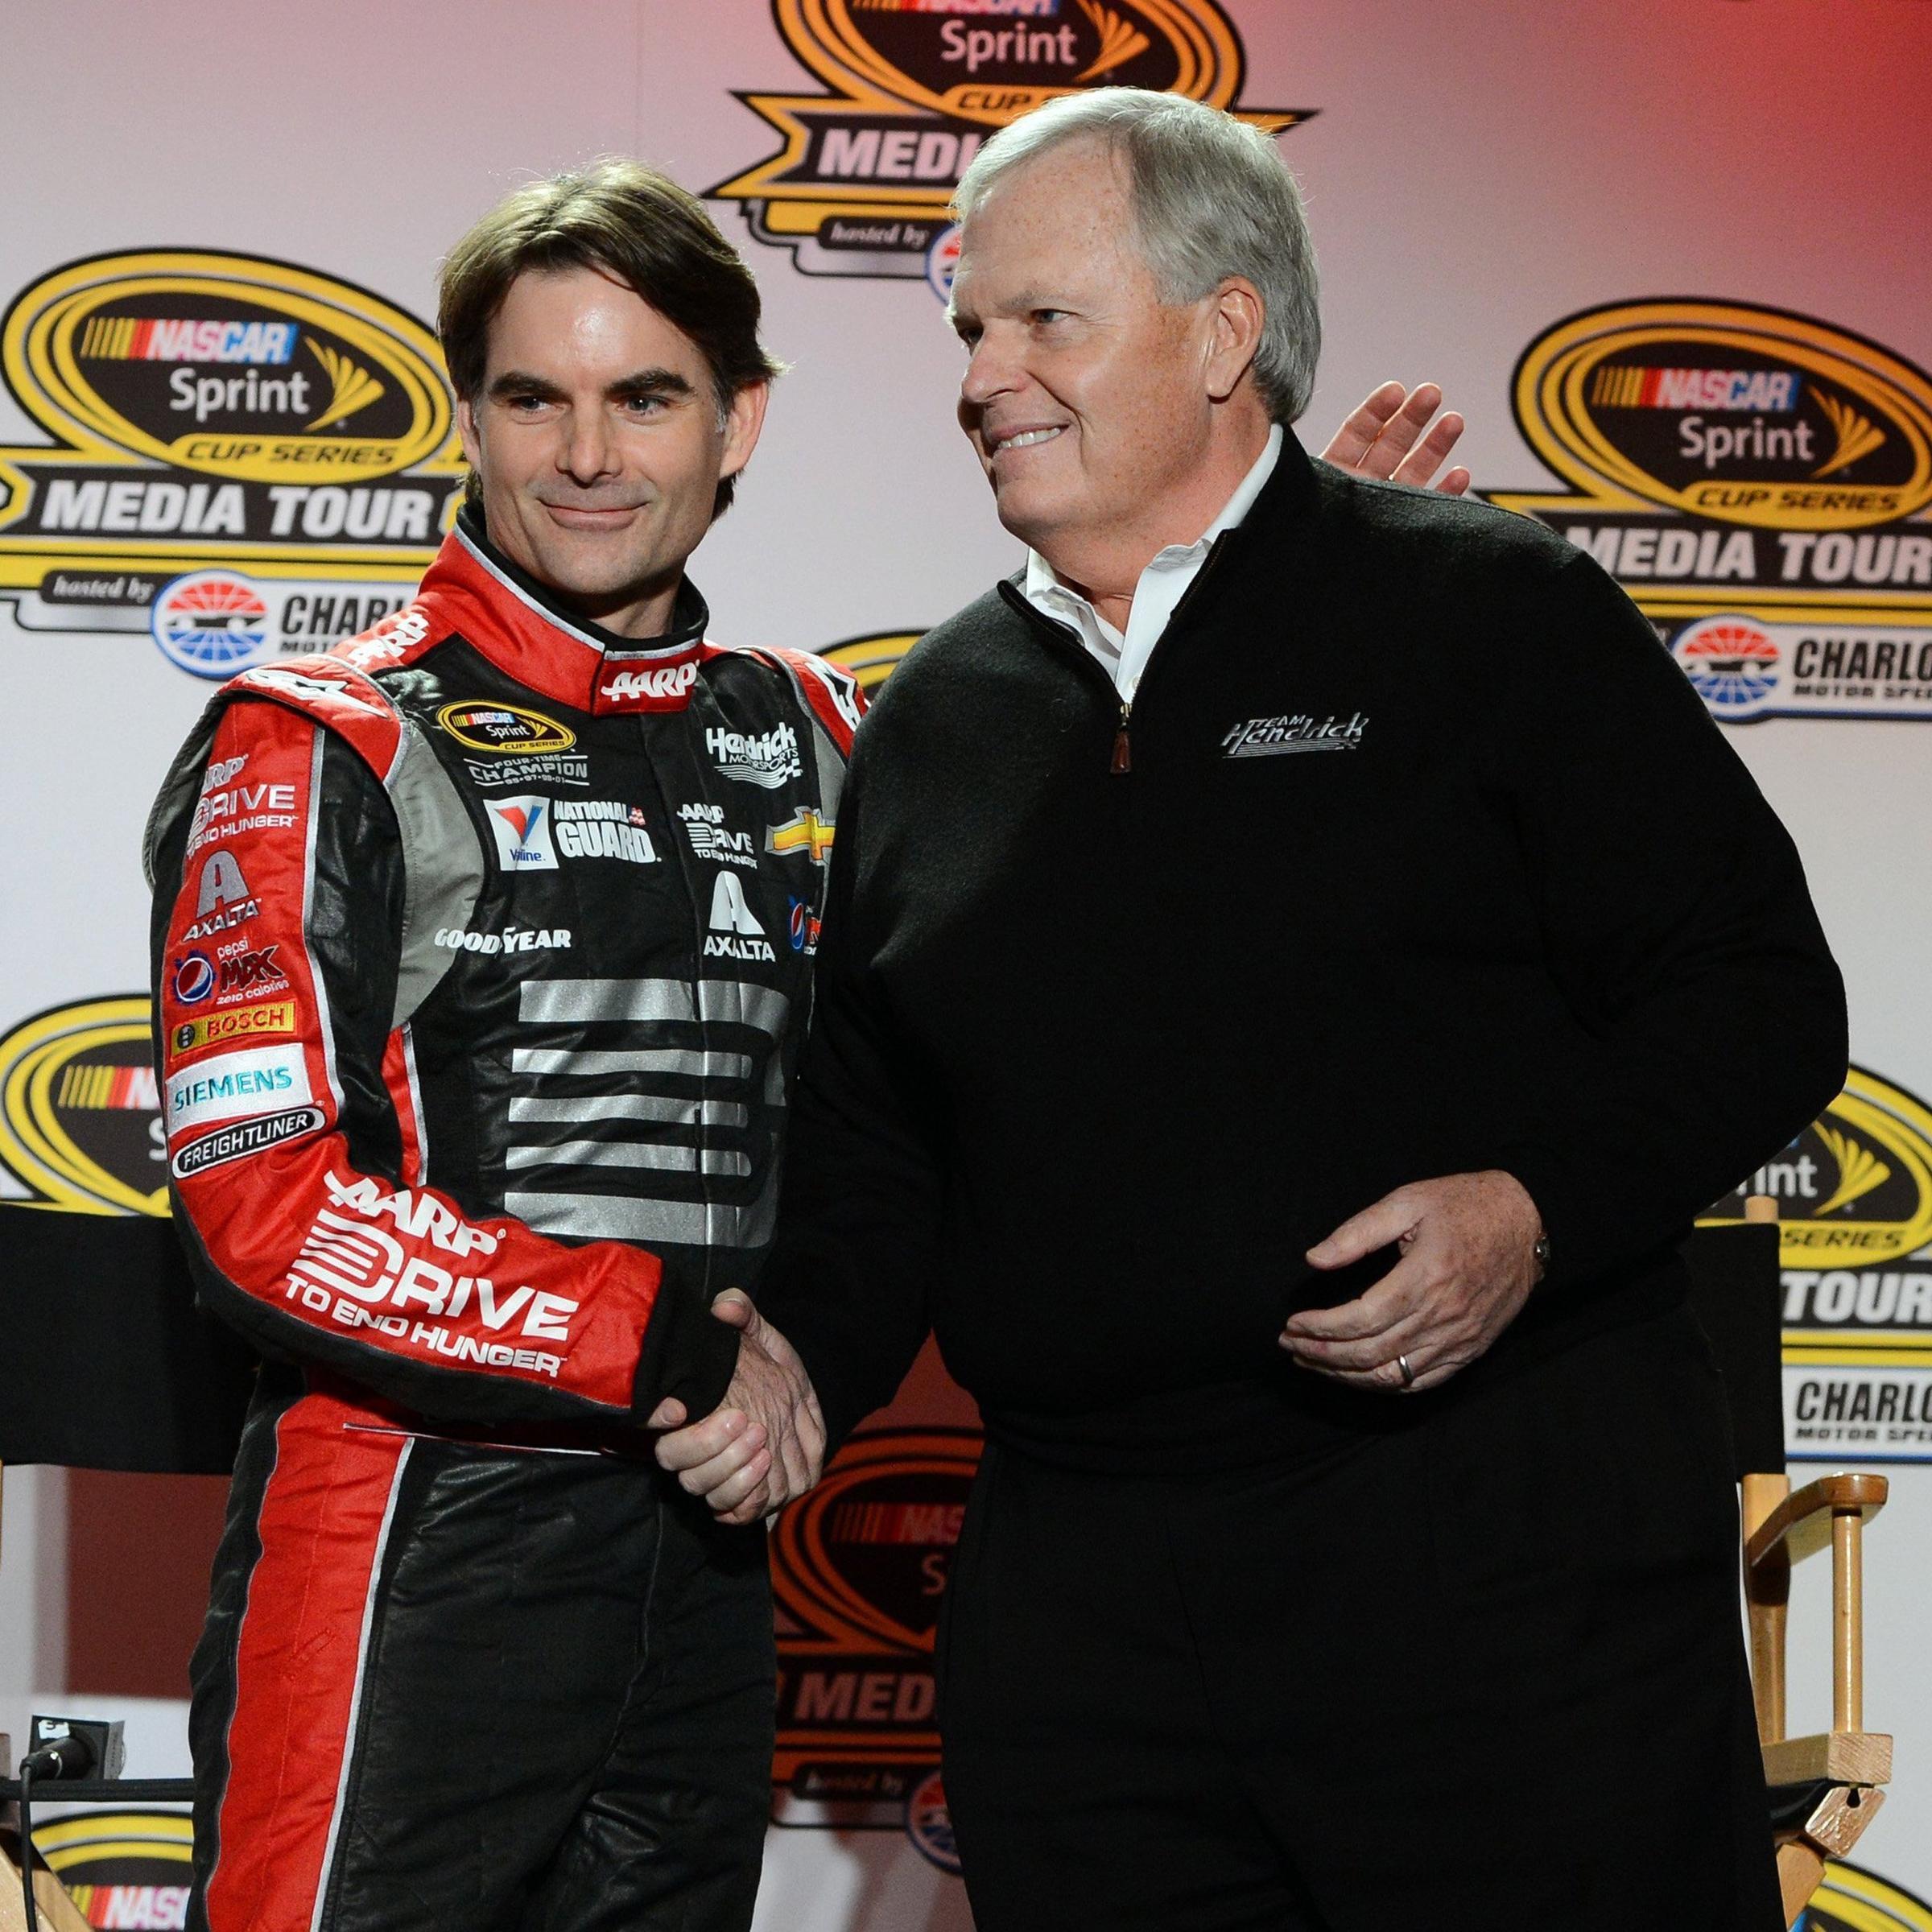 Jeff Gordon Says 2015 Will Be His Last Full NASCAR Season